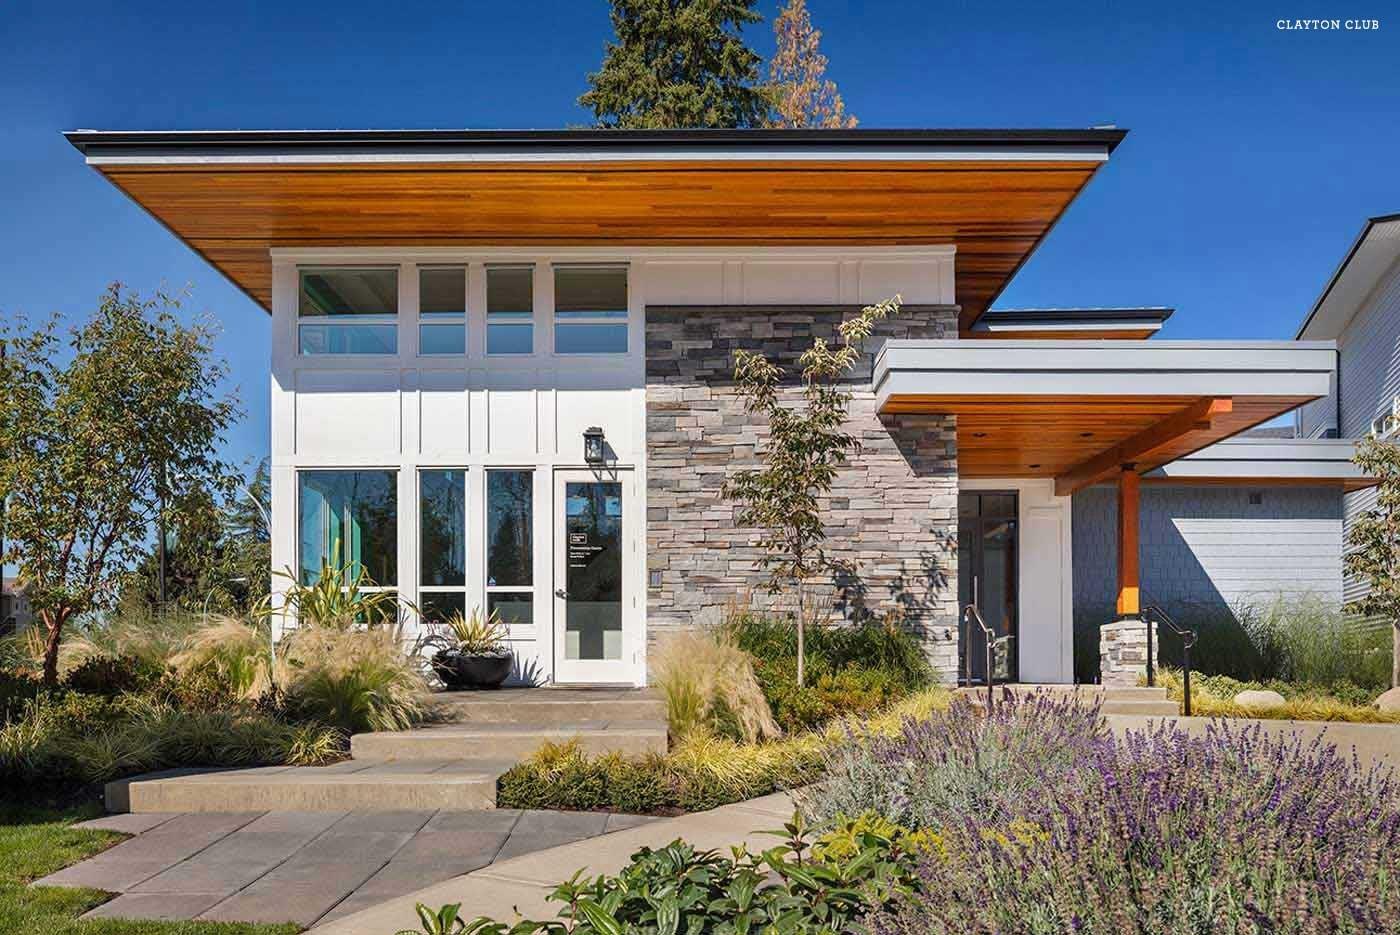 Amenity Building - 18505 Laurensen Place, Surrey, BC V4N 6R7, Canada!